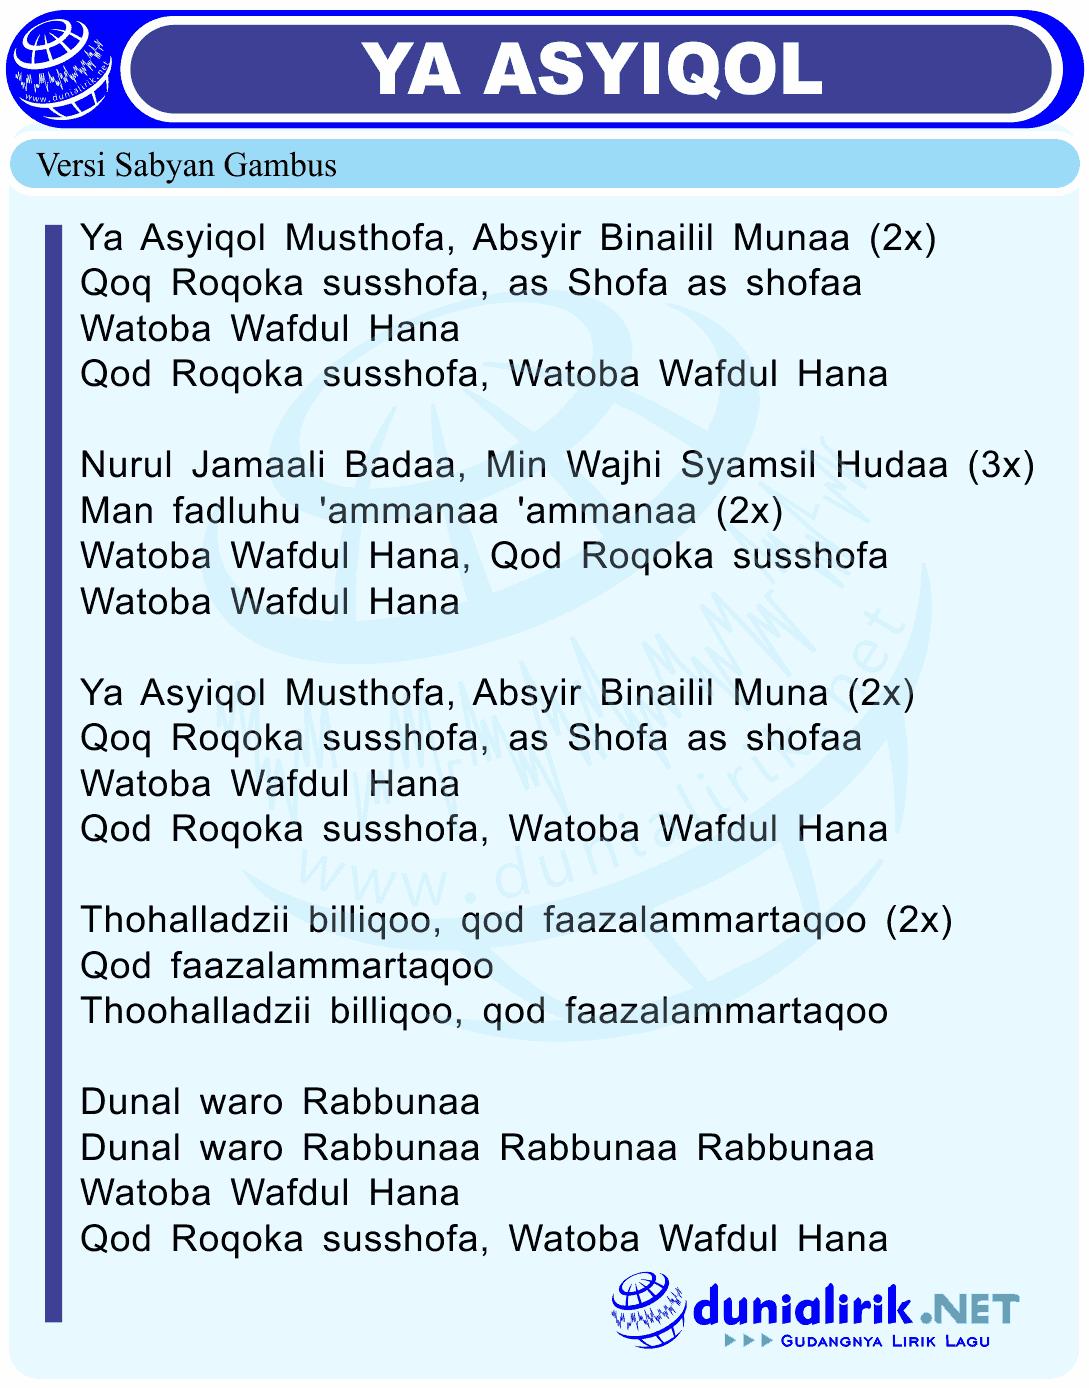 Lirik Ya Asyiqol Sabyan : lirik, asyiqol, sabyan, Lirik, Asyiqol